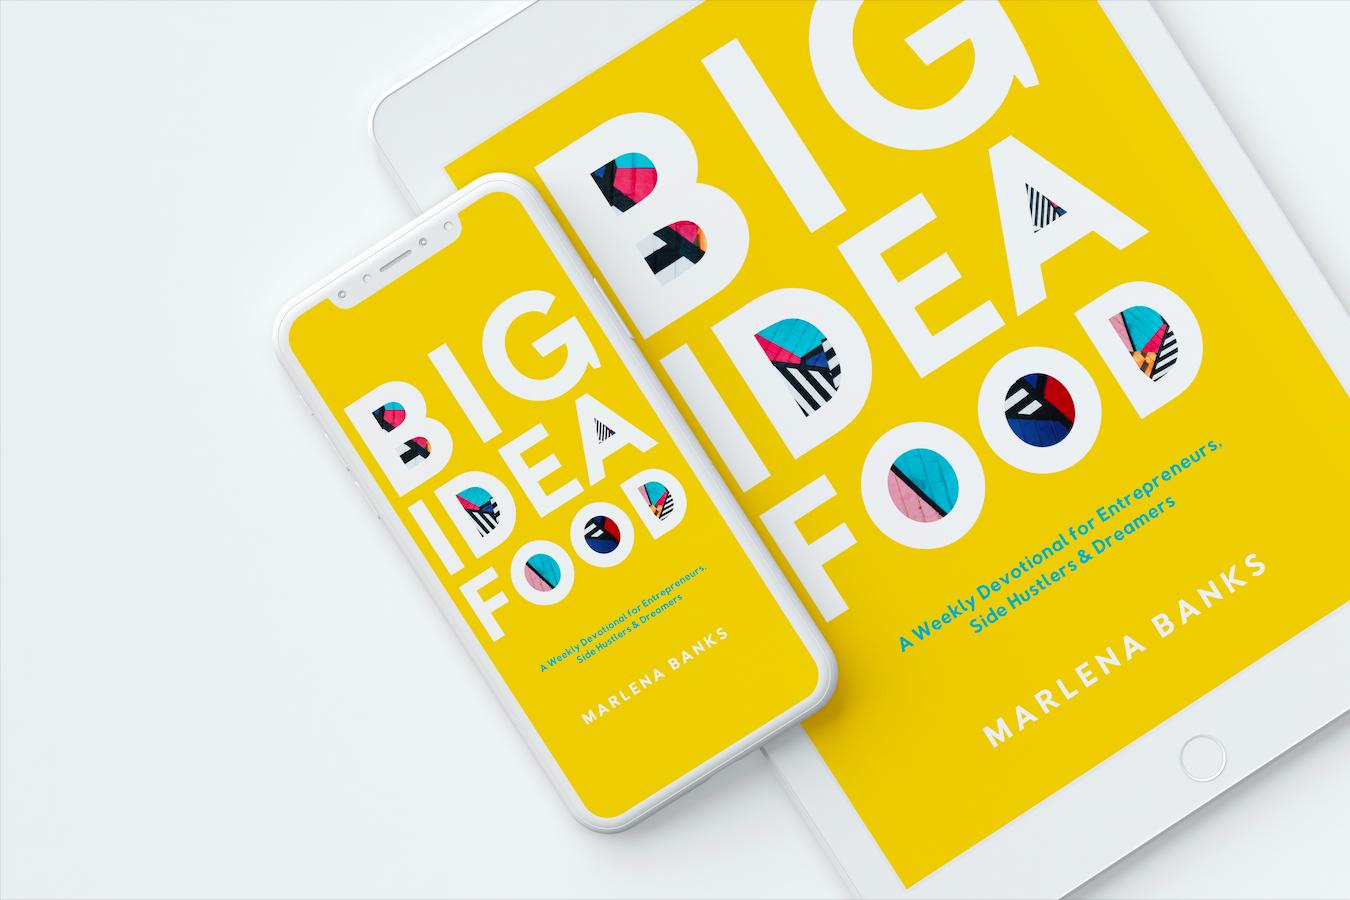 BigIdeaFood-digital-cover.png